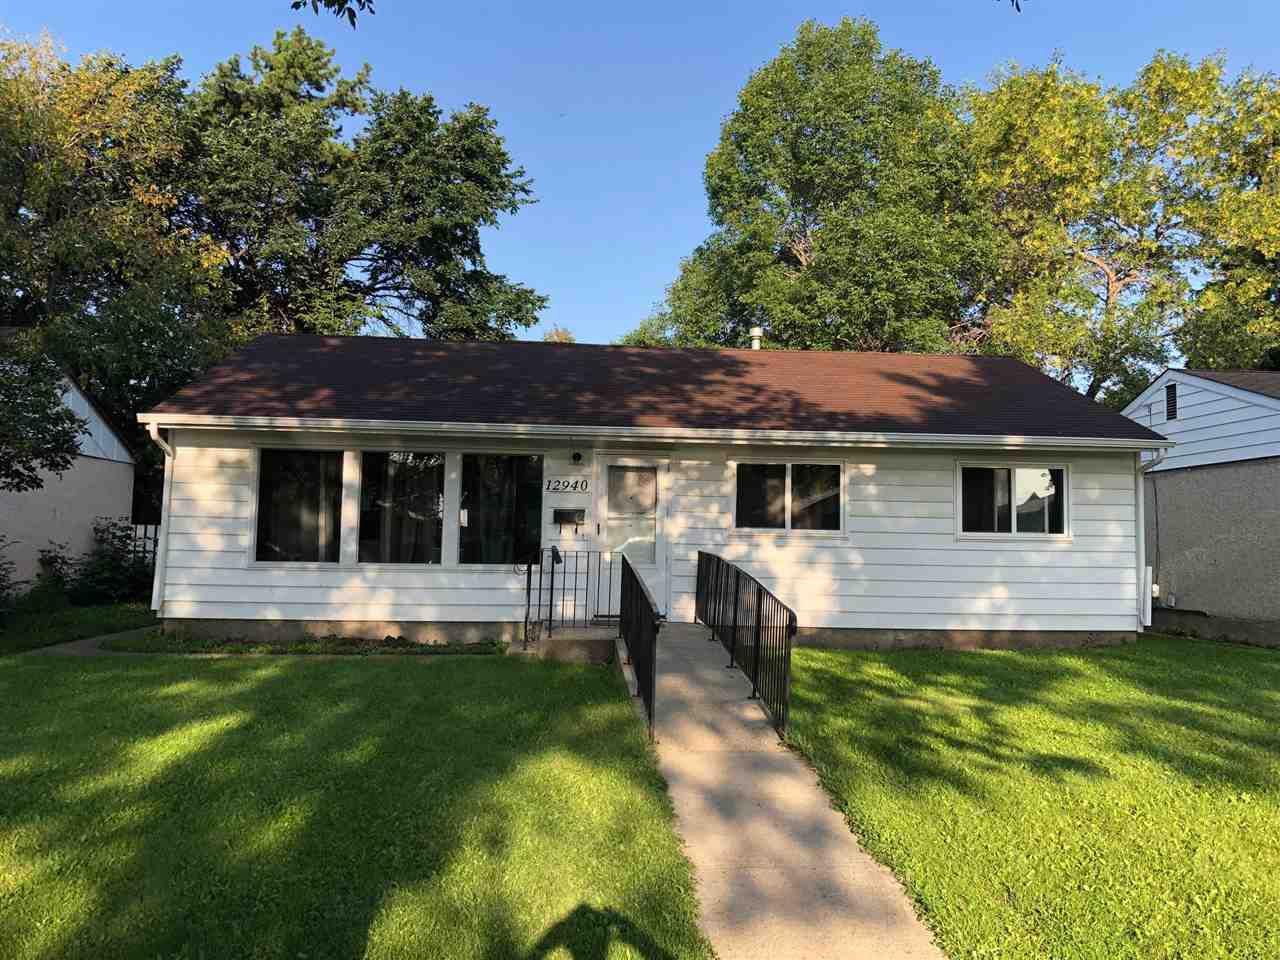 Main Photo: 12940 114 Street in Edmonton: Zone 01 House for sale : MLS®# E4170935